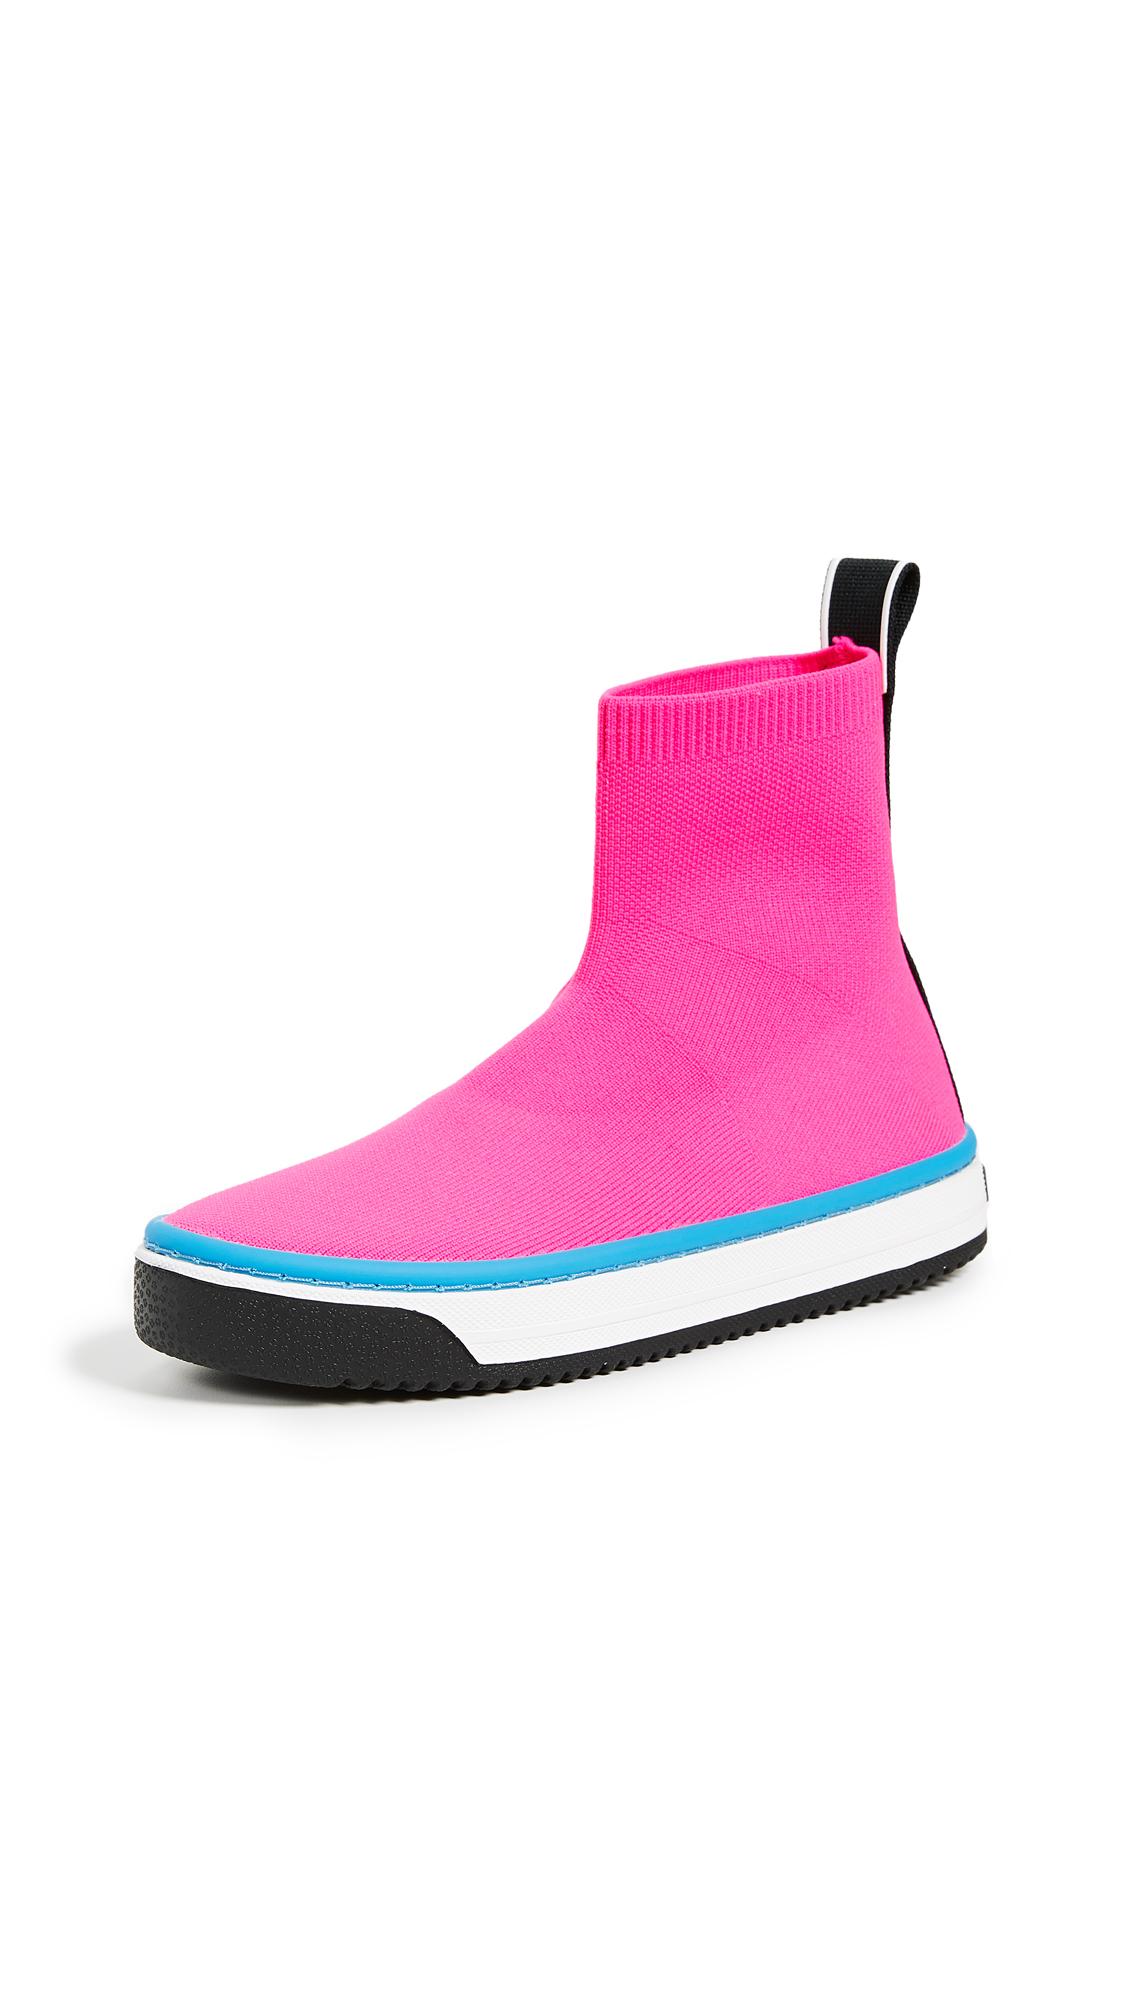 Marc Jacobs Dart Sock Sneakers - Pink